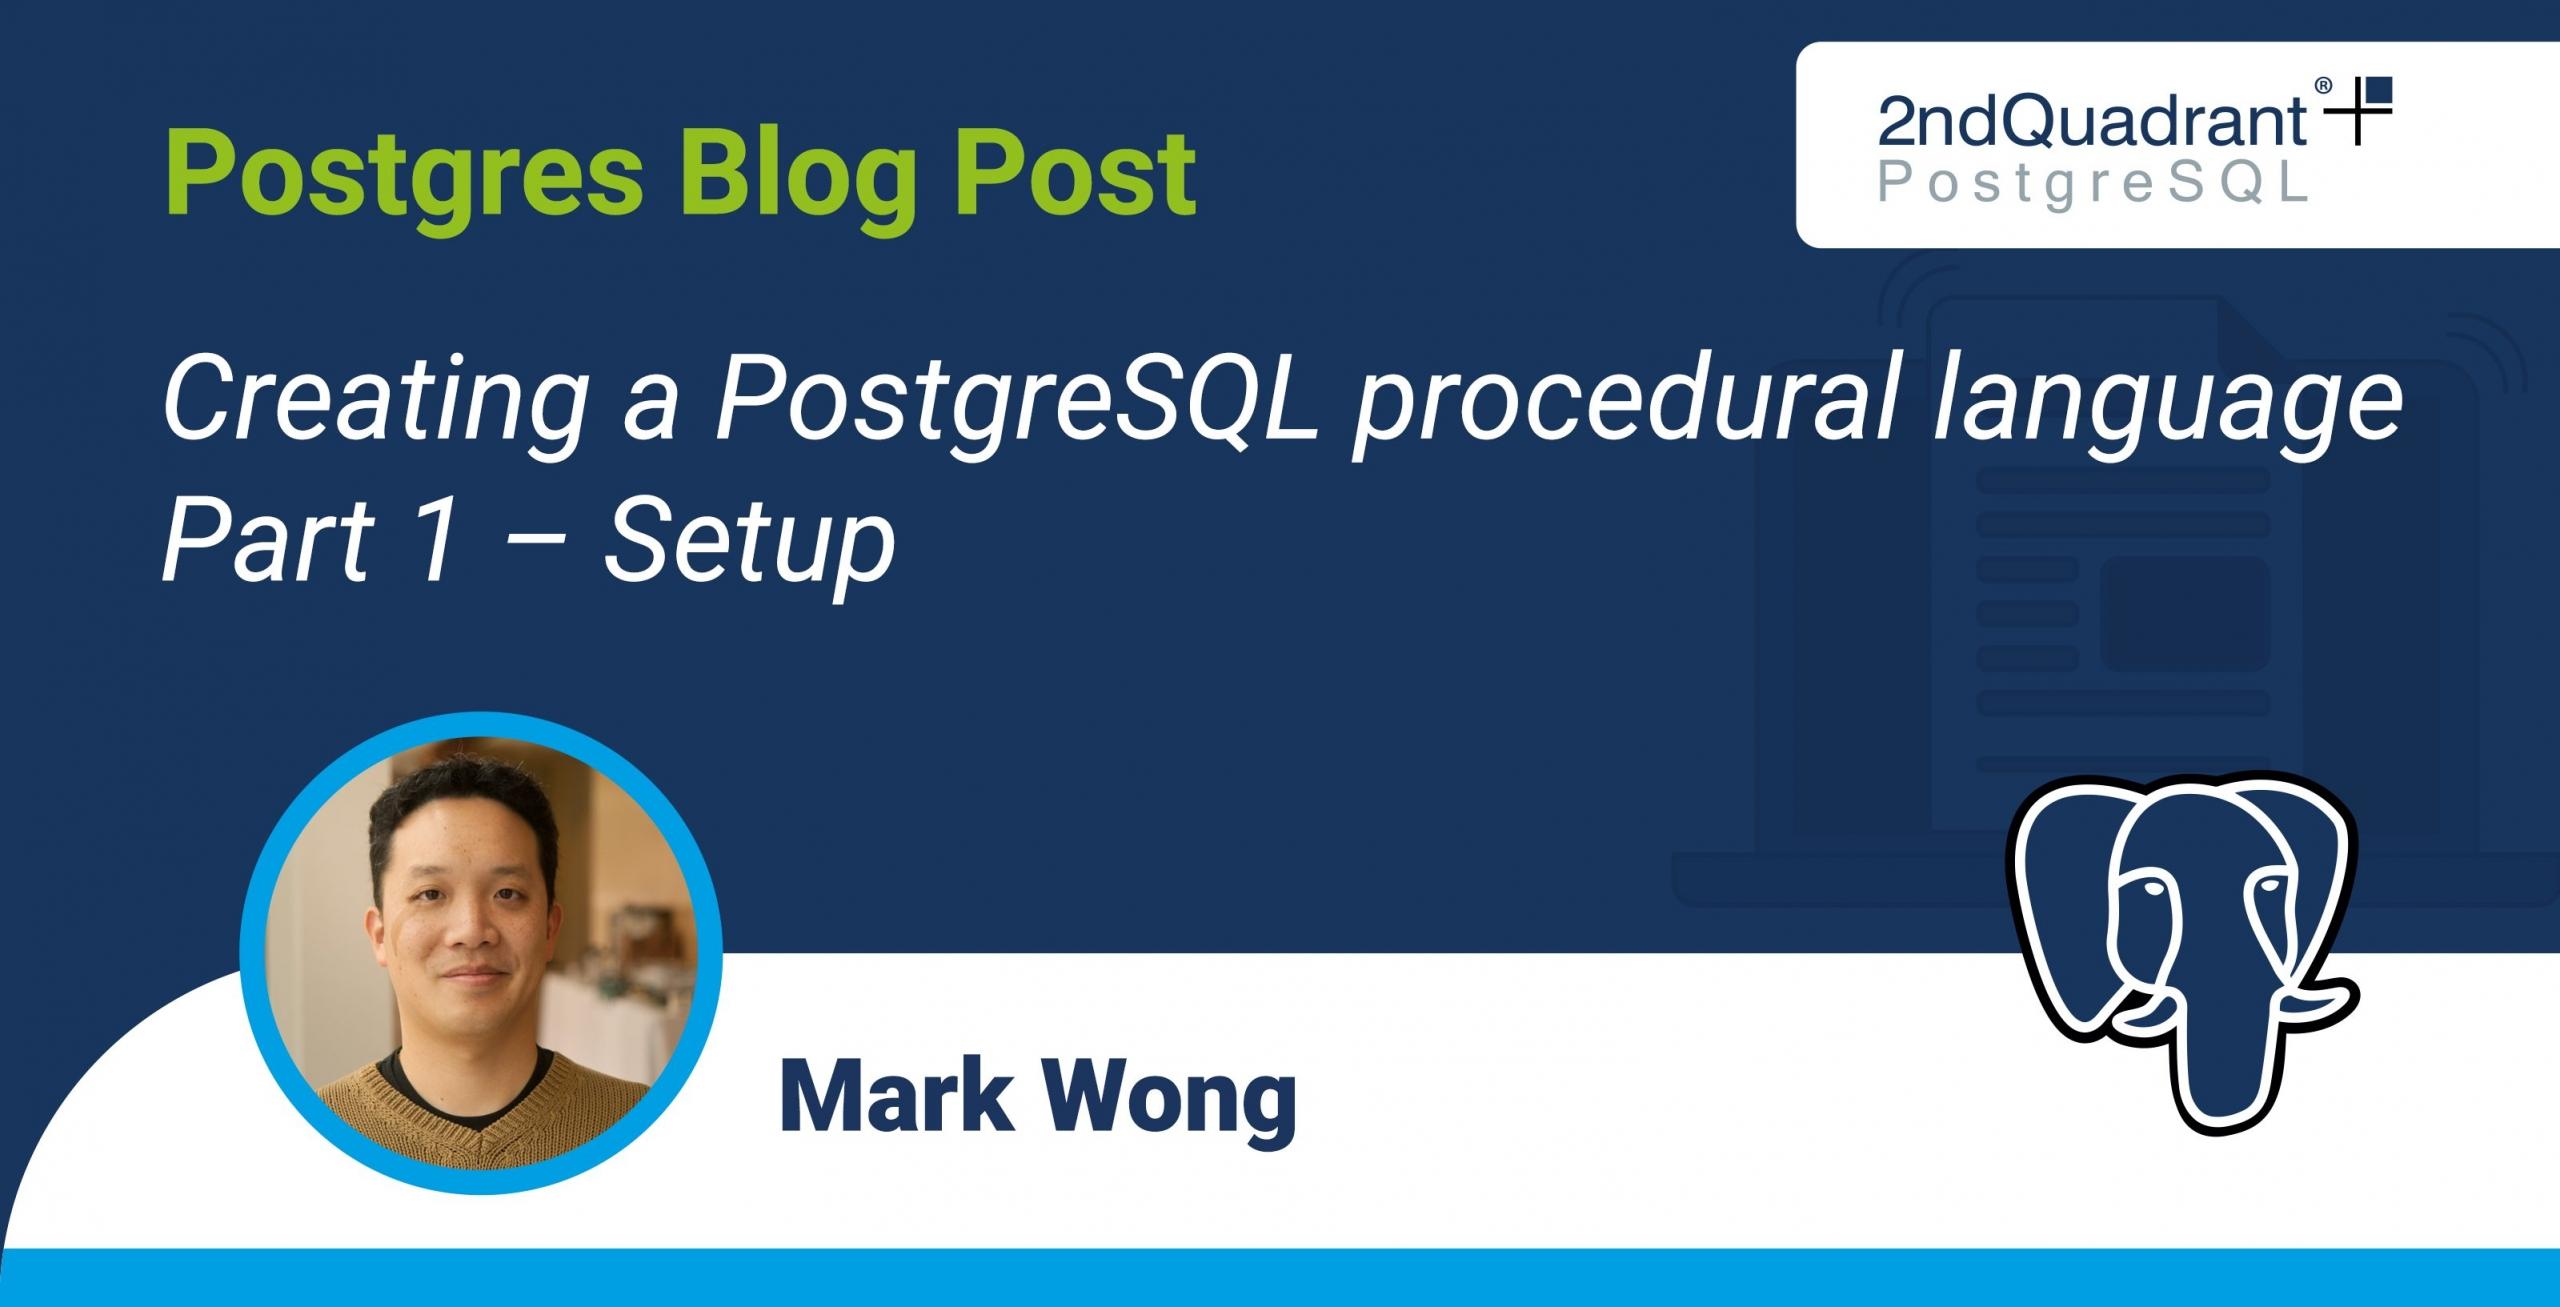 Creating a PostgreSQL procedural language - Part 1 - Setup